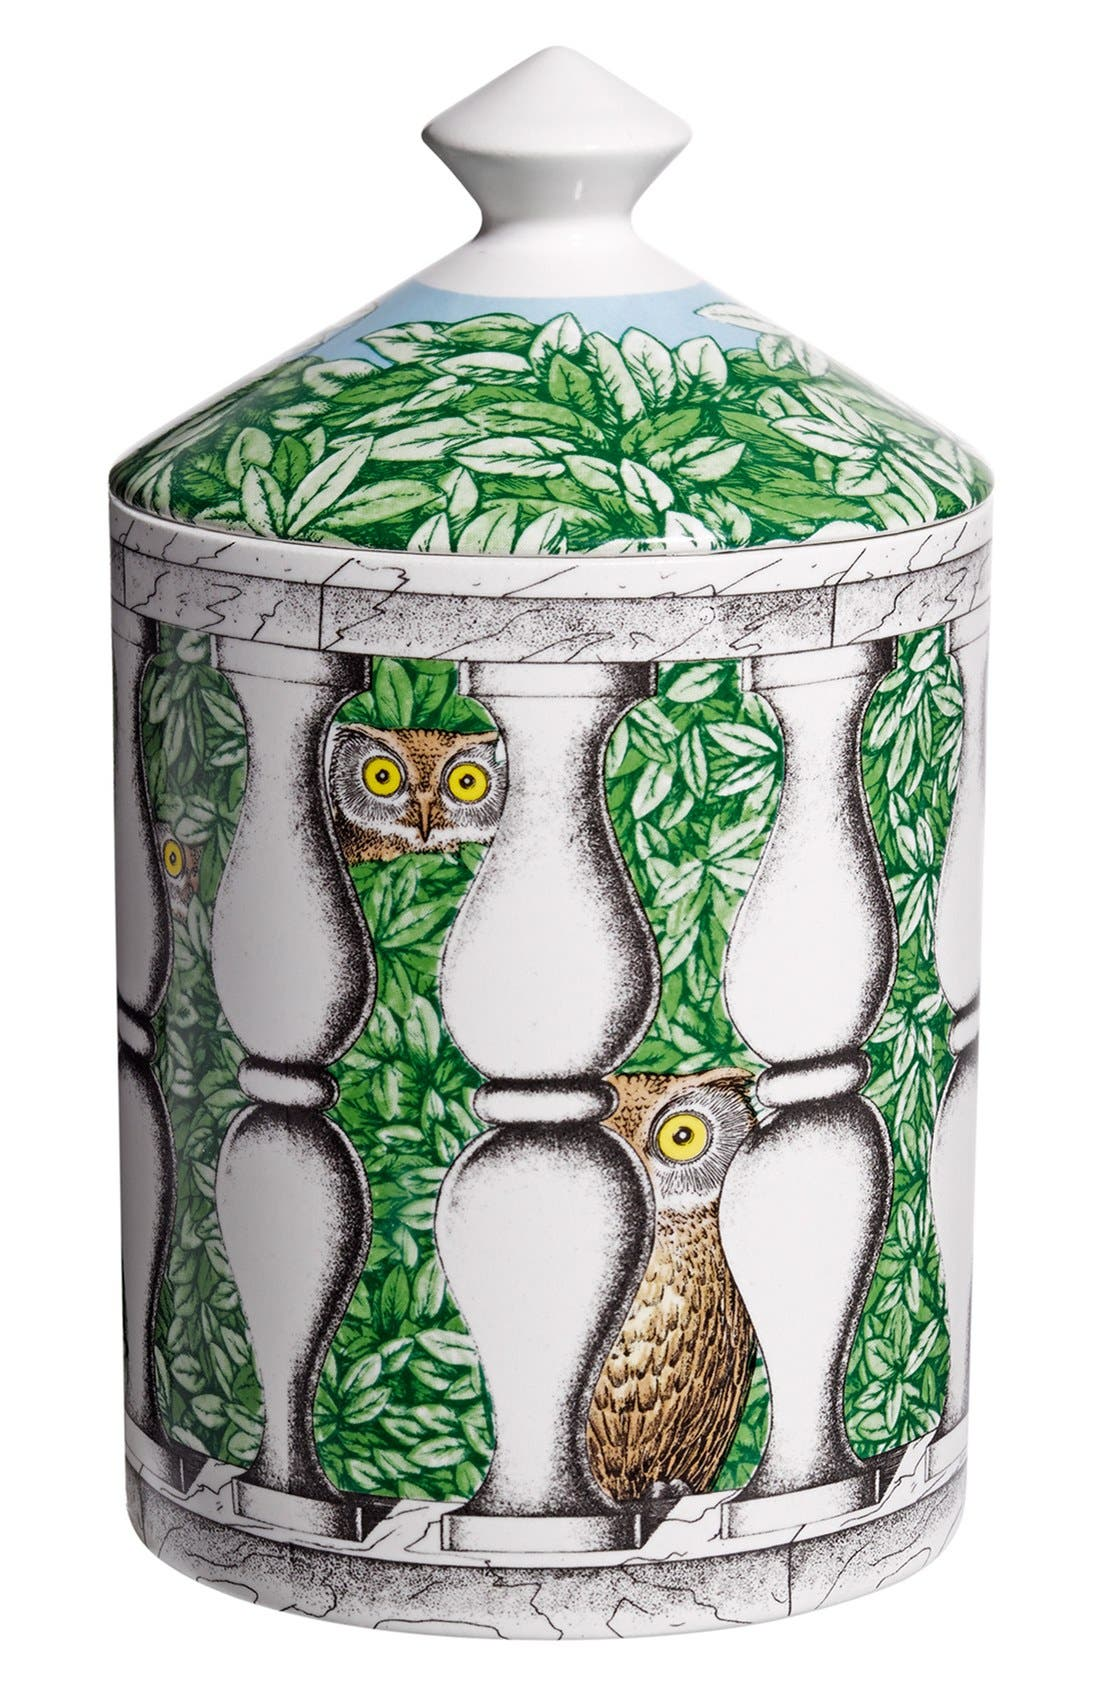 'Balaustra - Segretto' Lidded Candle,                             Main thumbnail 1, color,                             000